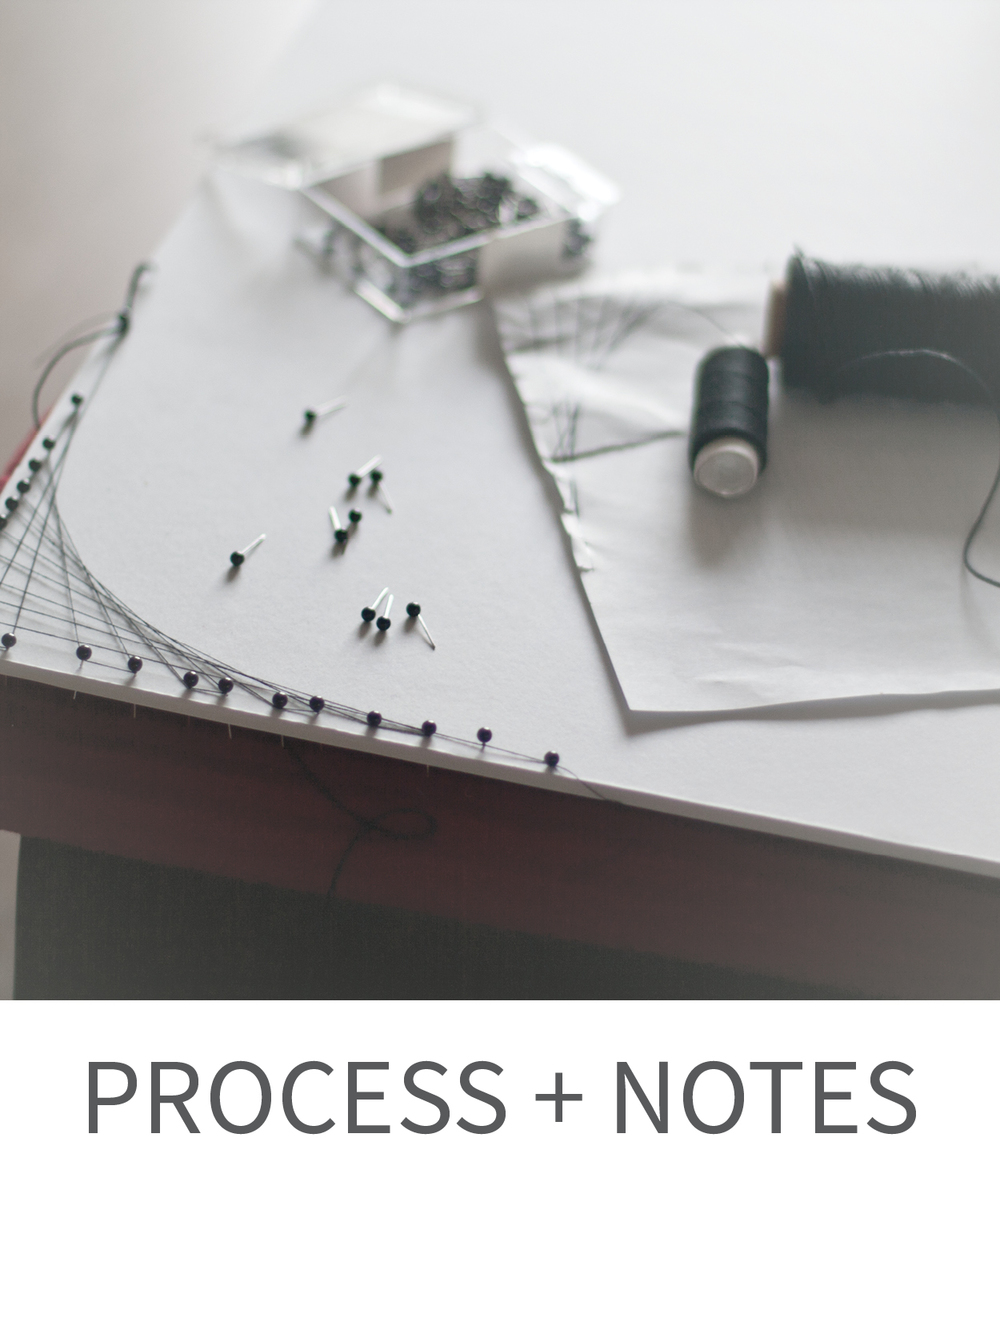 ProcessNotes